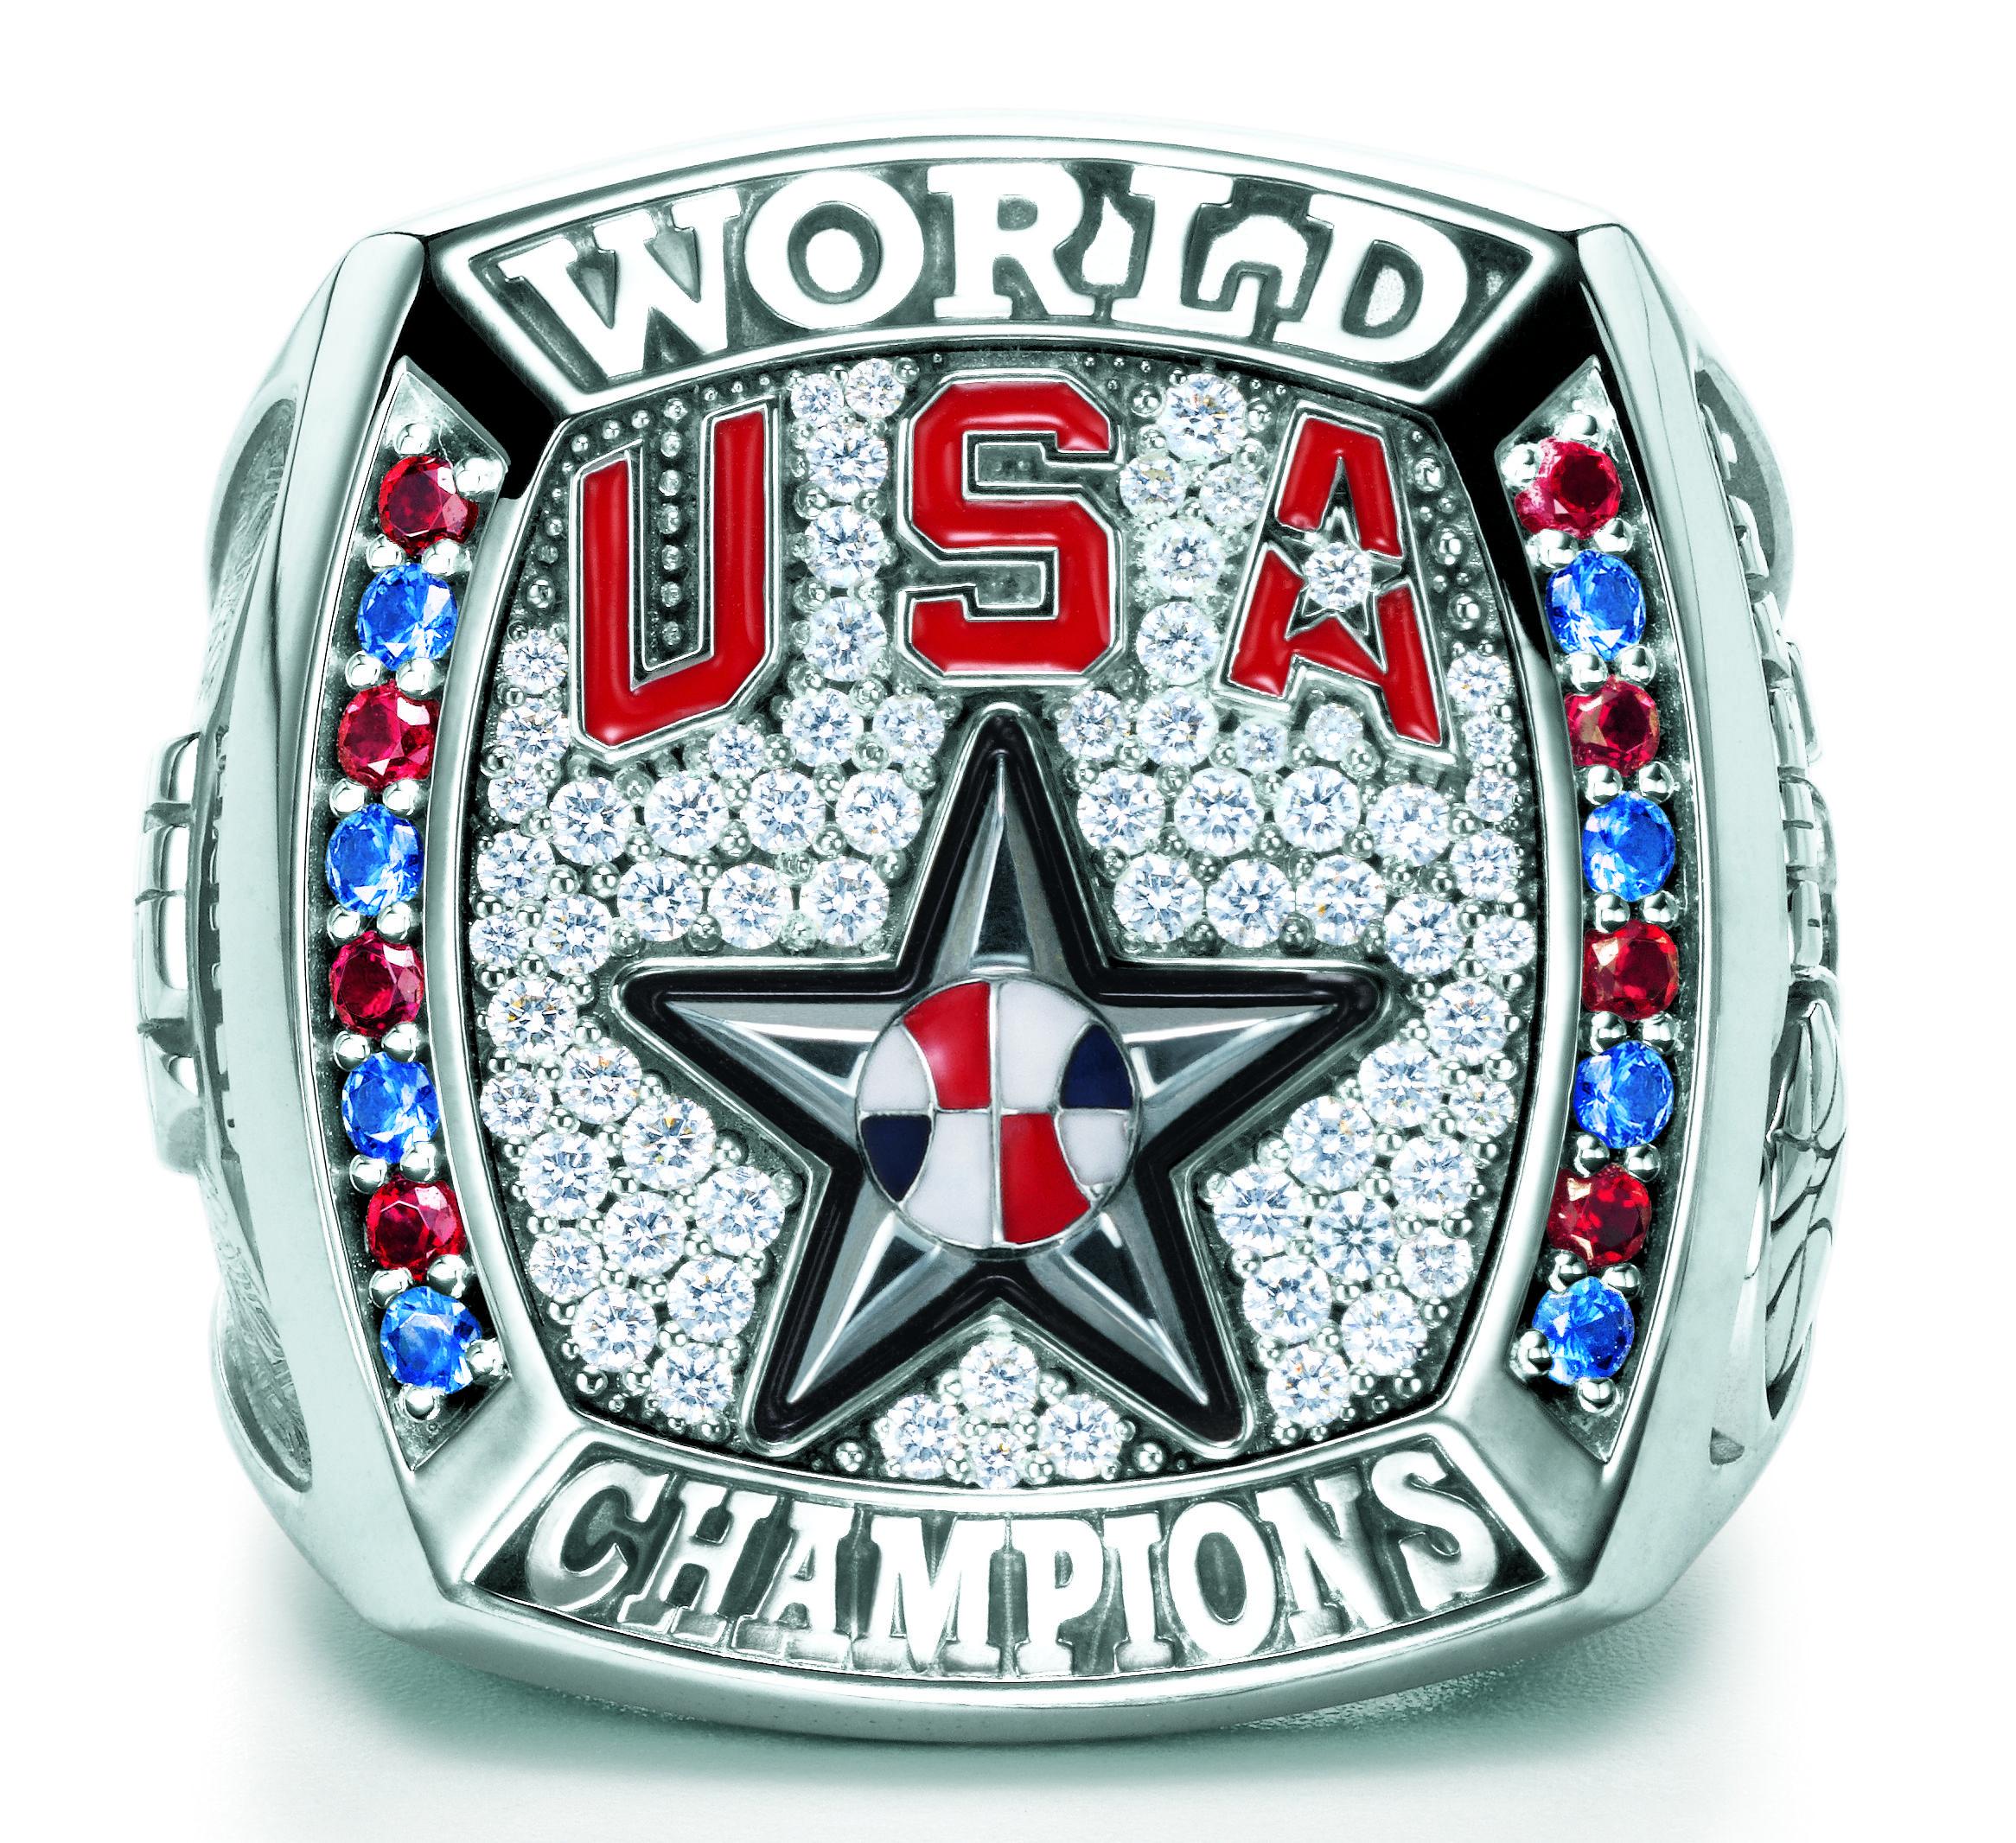 2010 Fiba World Championship Ring Championship Rings Baseball Ring College Rings